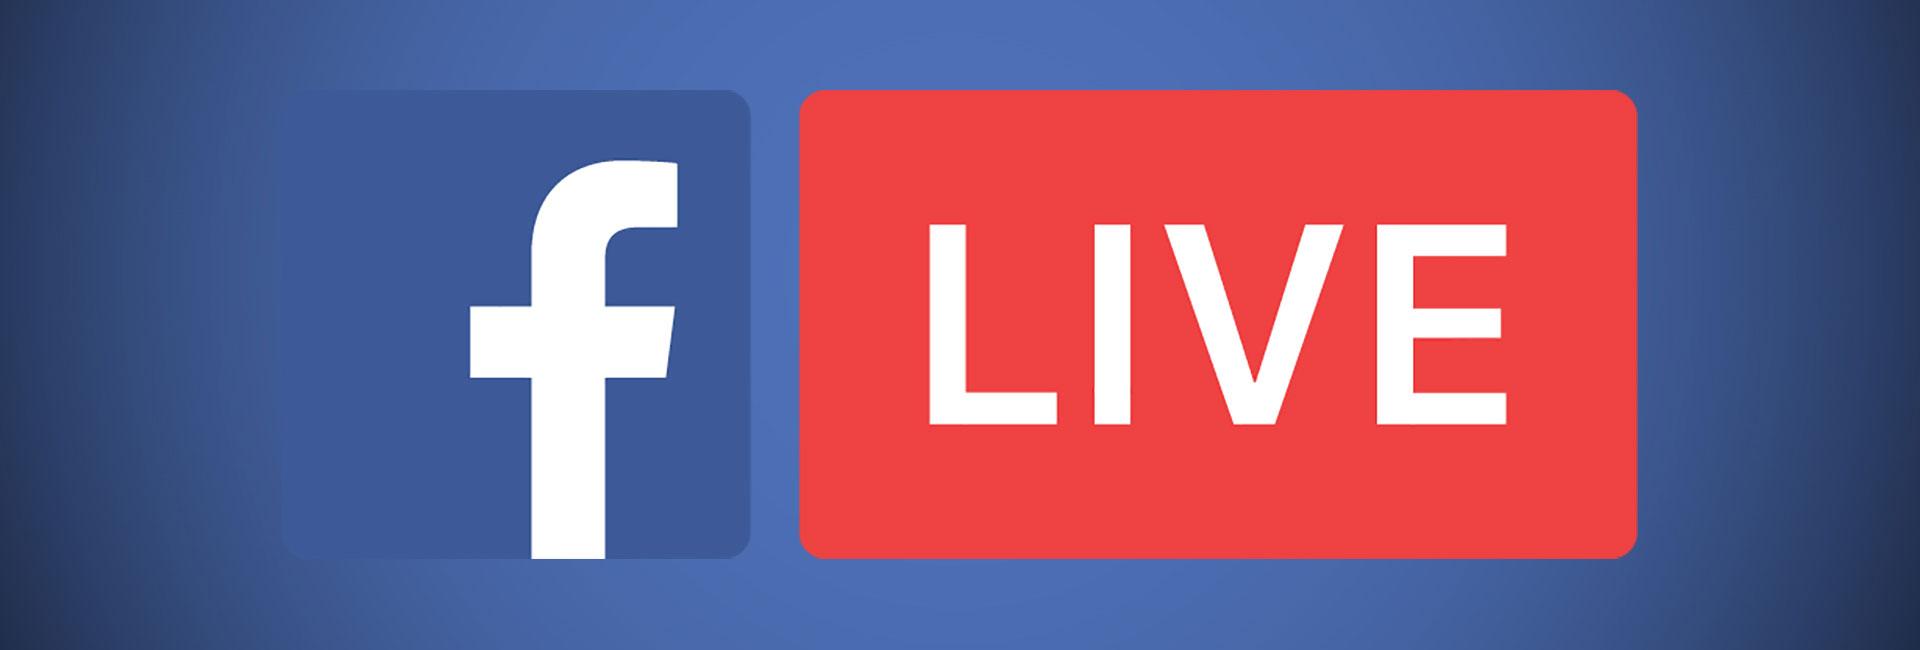 facebook webcast company